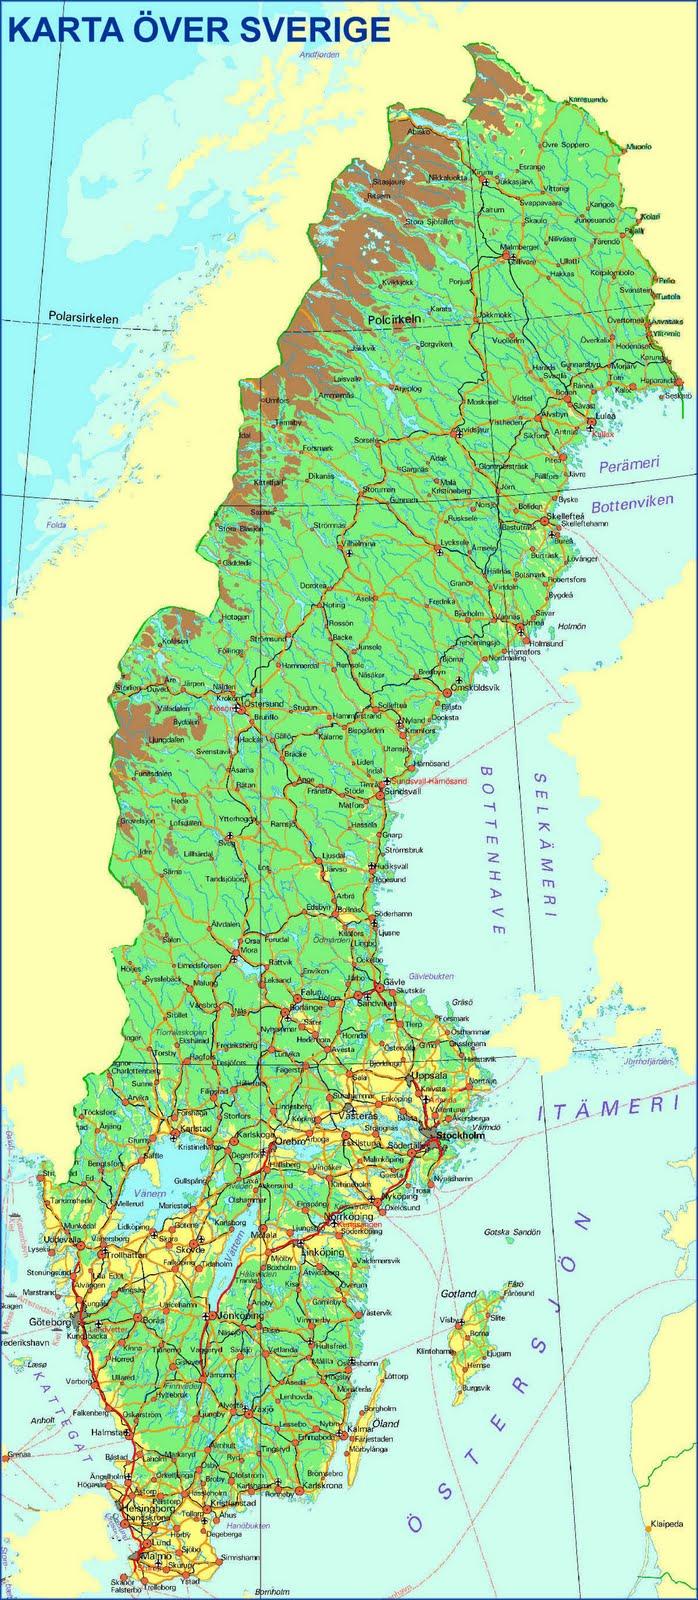 nord sverige kart Begynners   blogg om alt og ingenting: Sverige. nord sverige kart